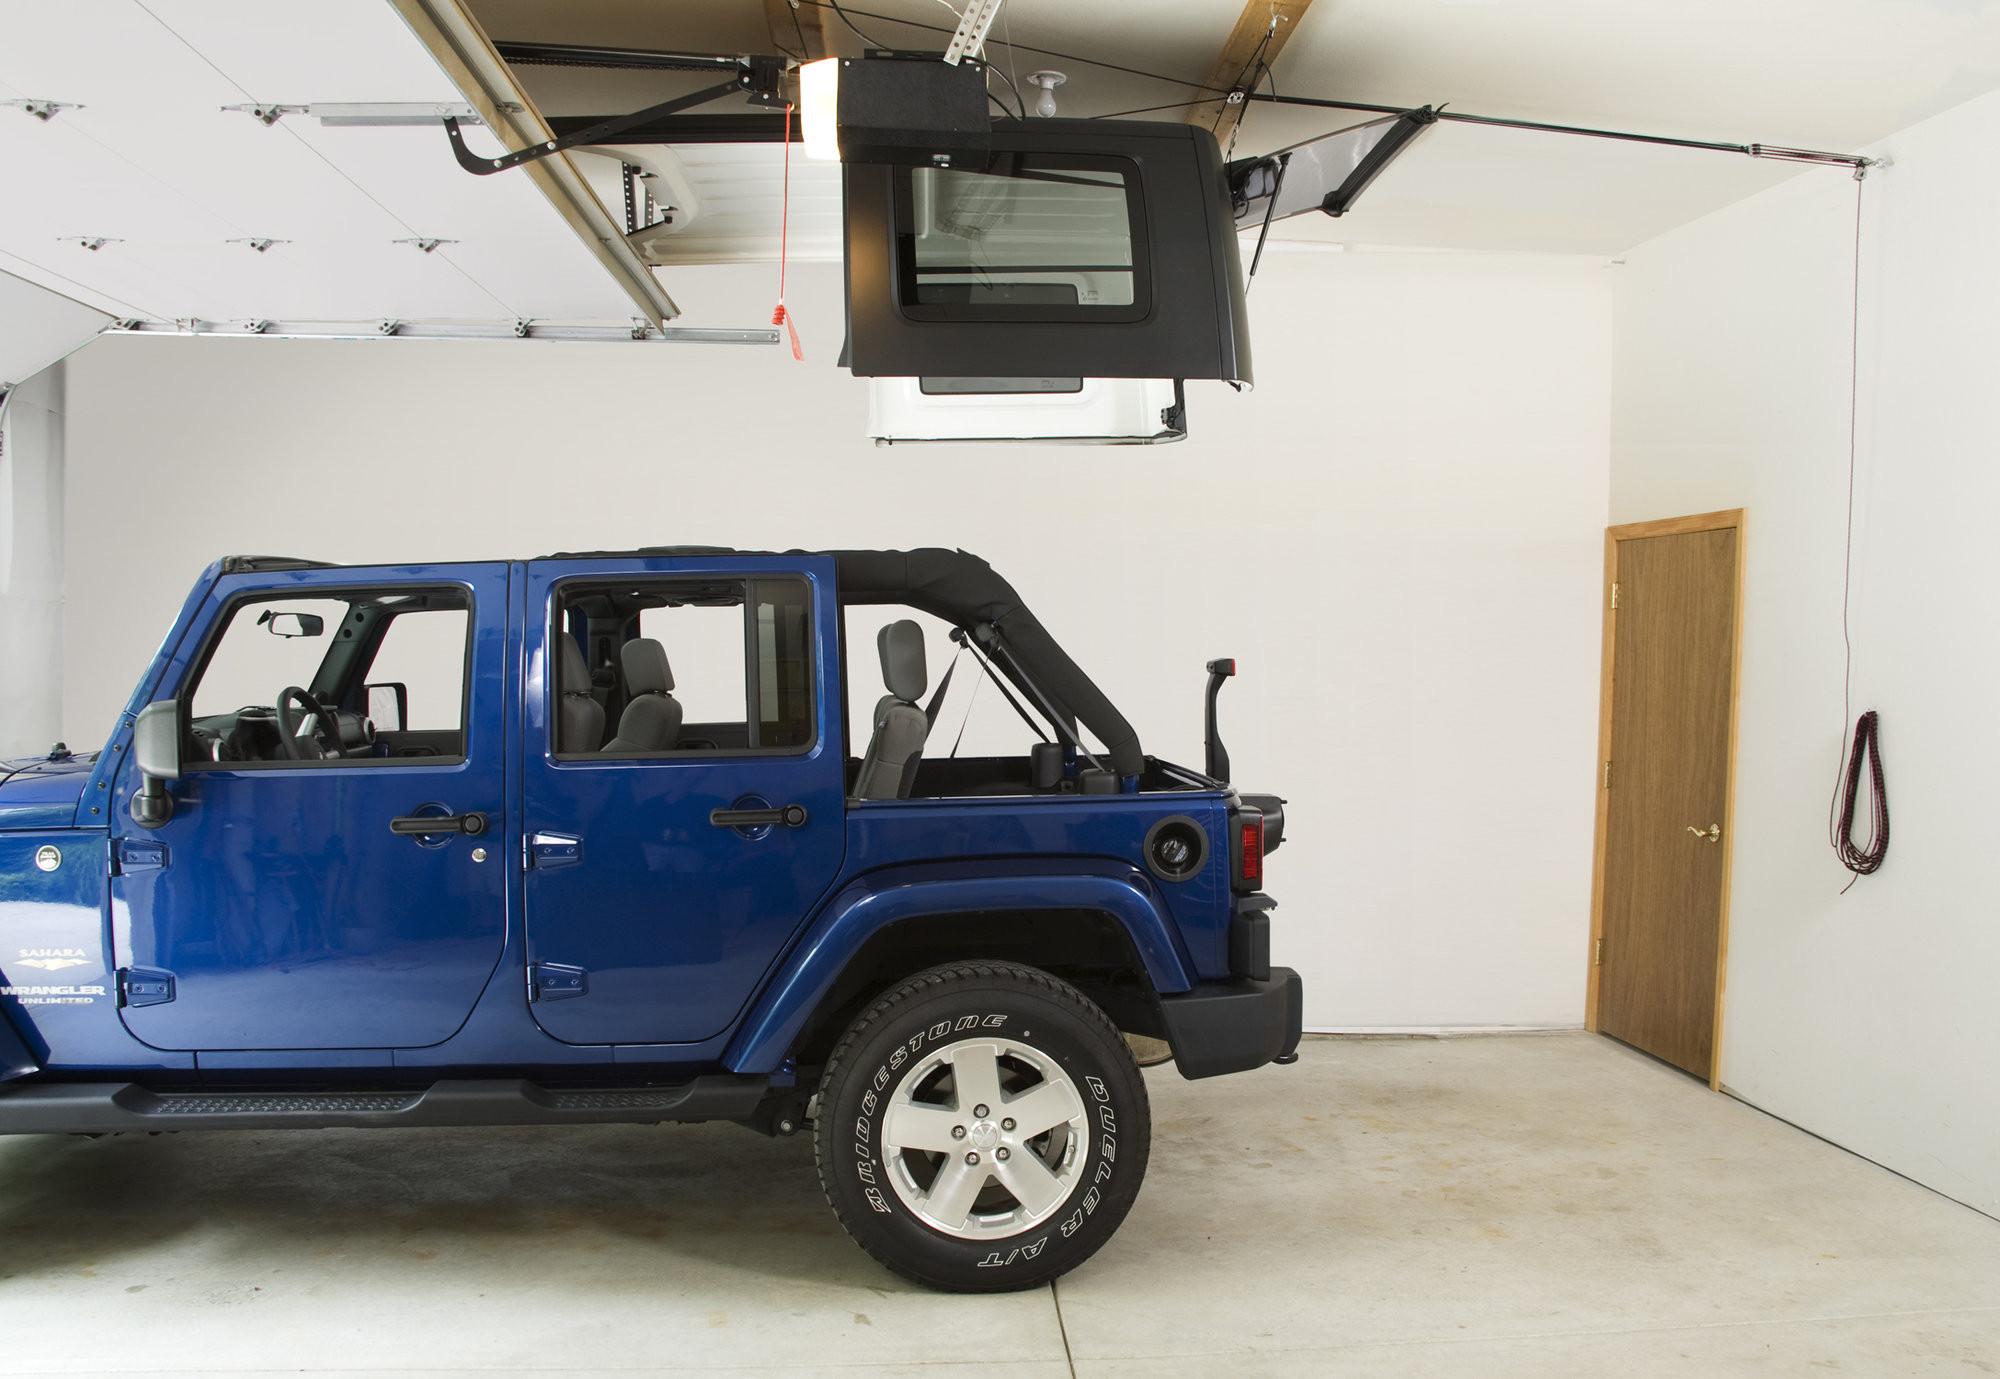 Harken Jeep Wrangler Hoister Garage Storage 4point Lift System